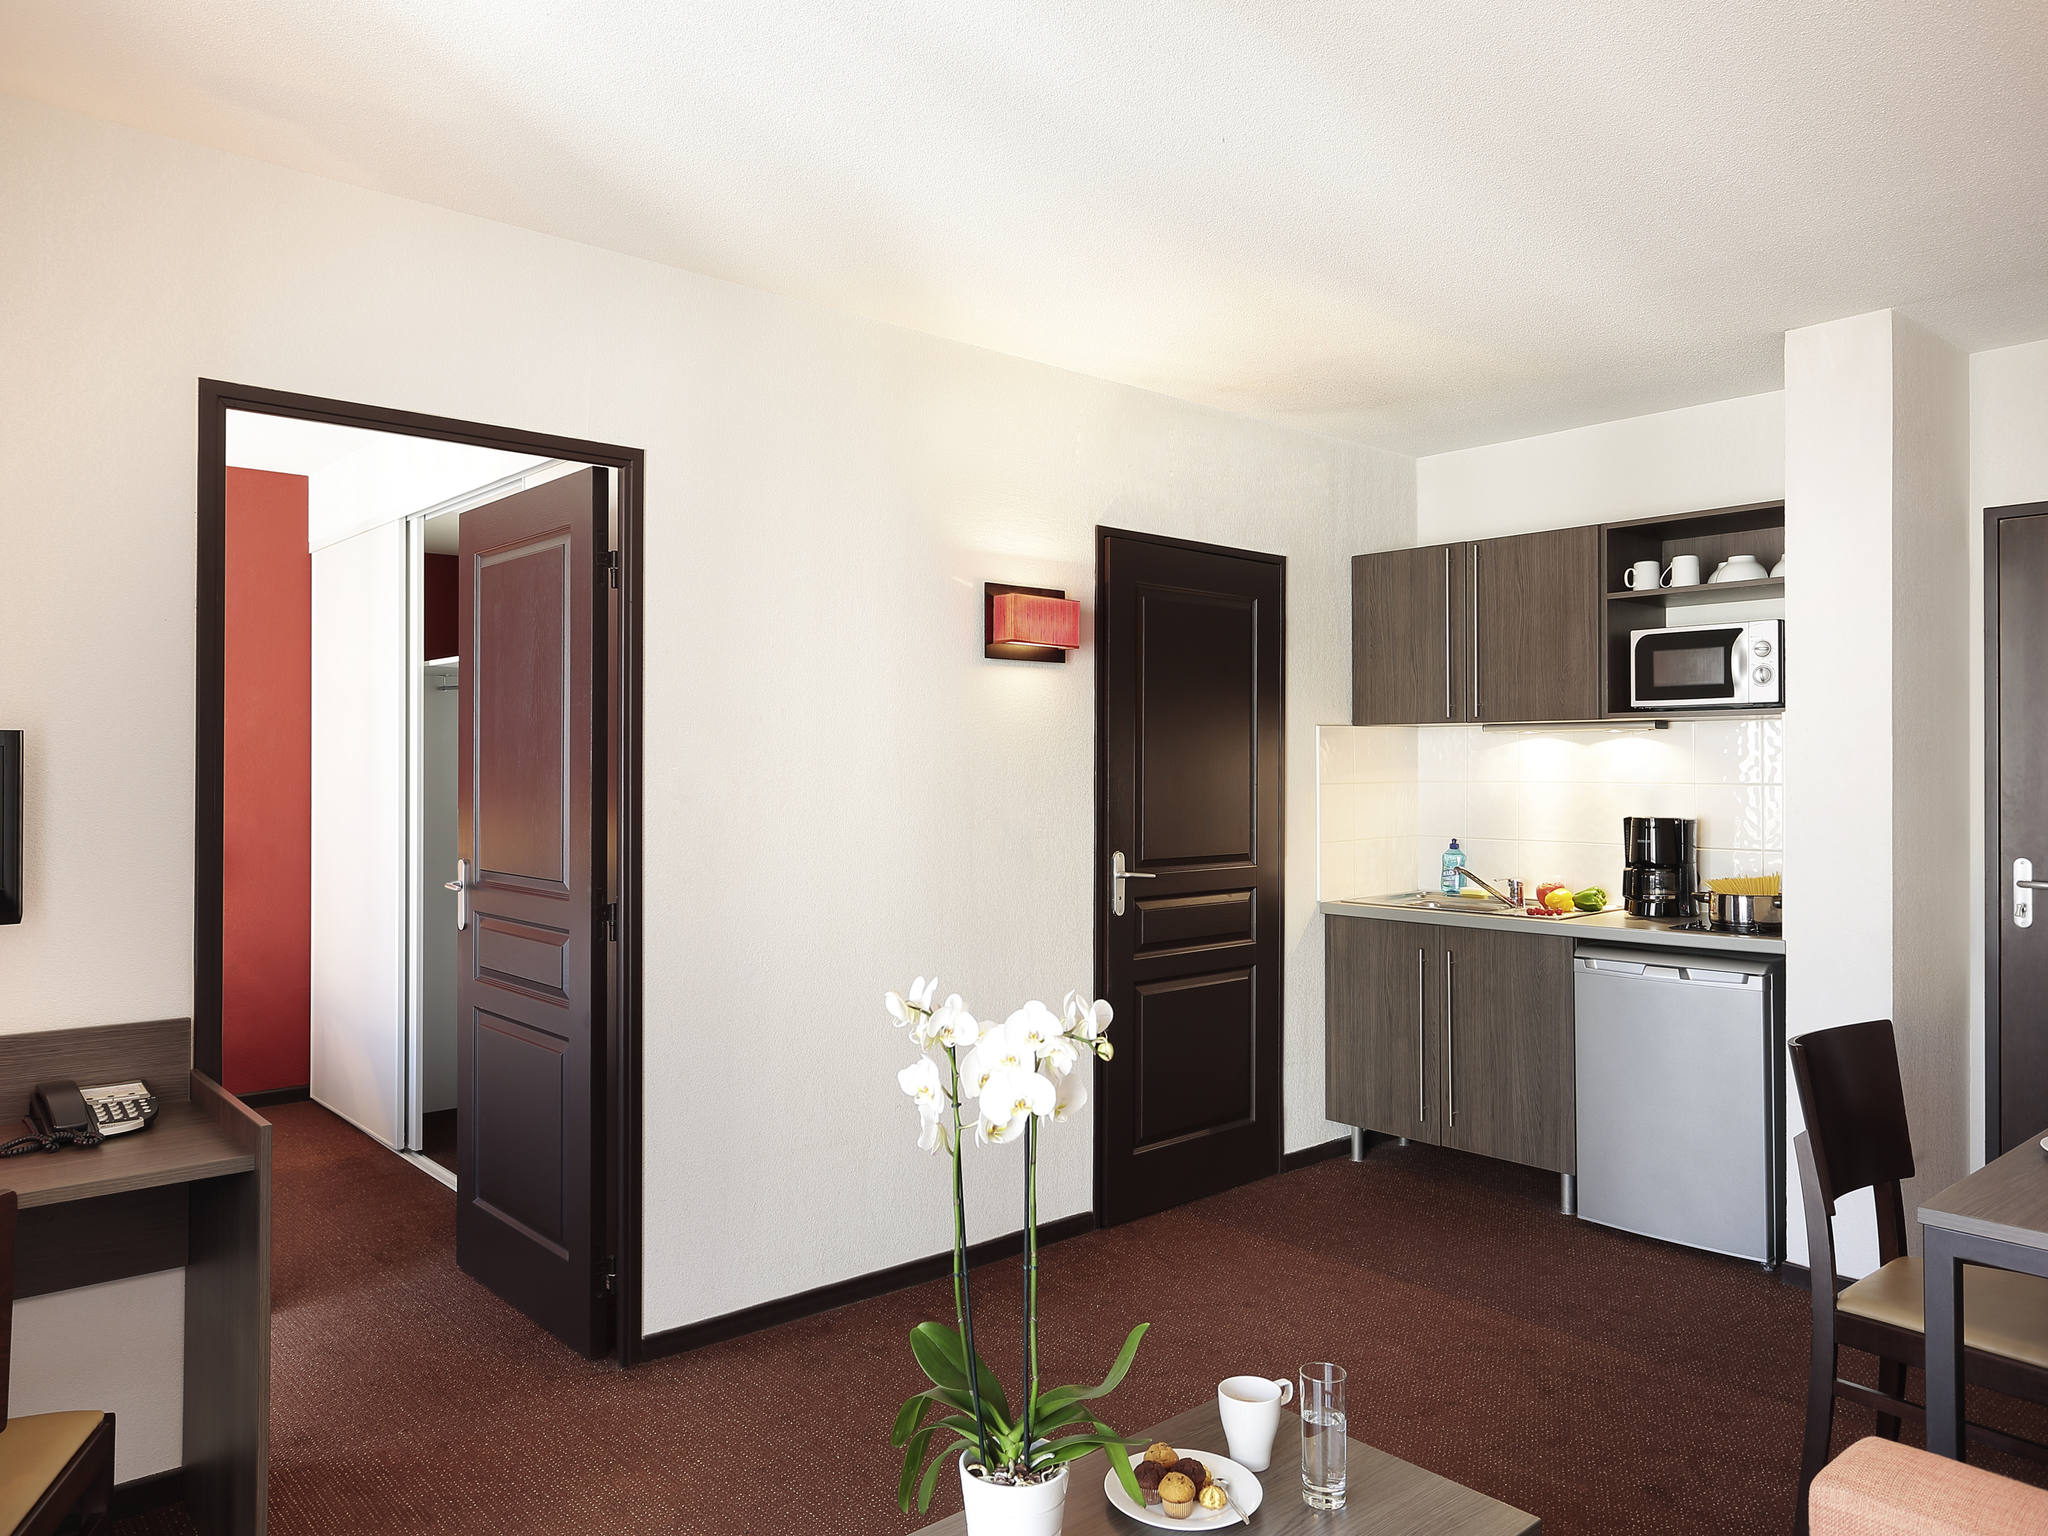 Hotel - Aparthotel Adagio access Nîmes